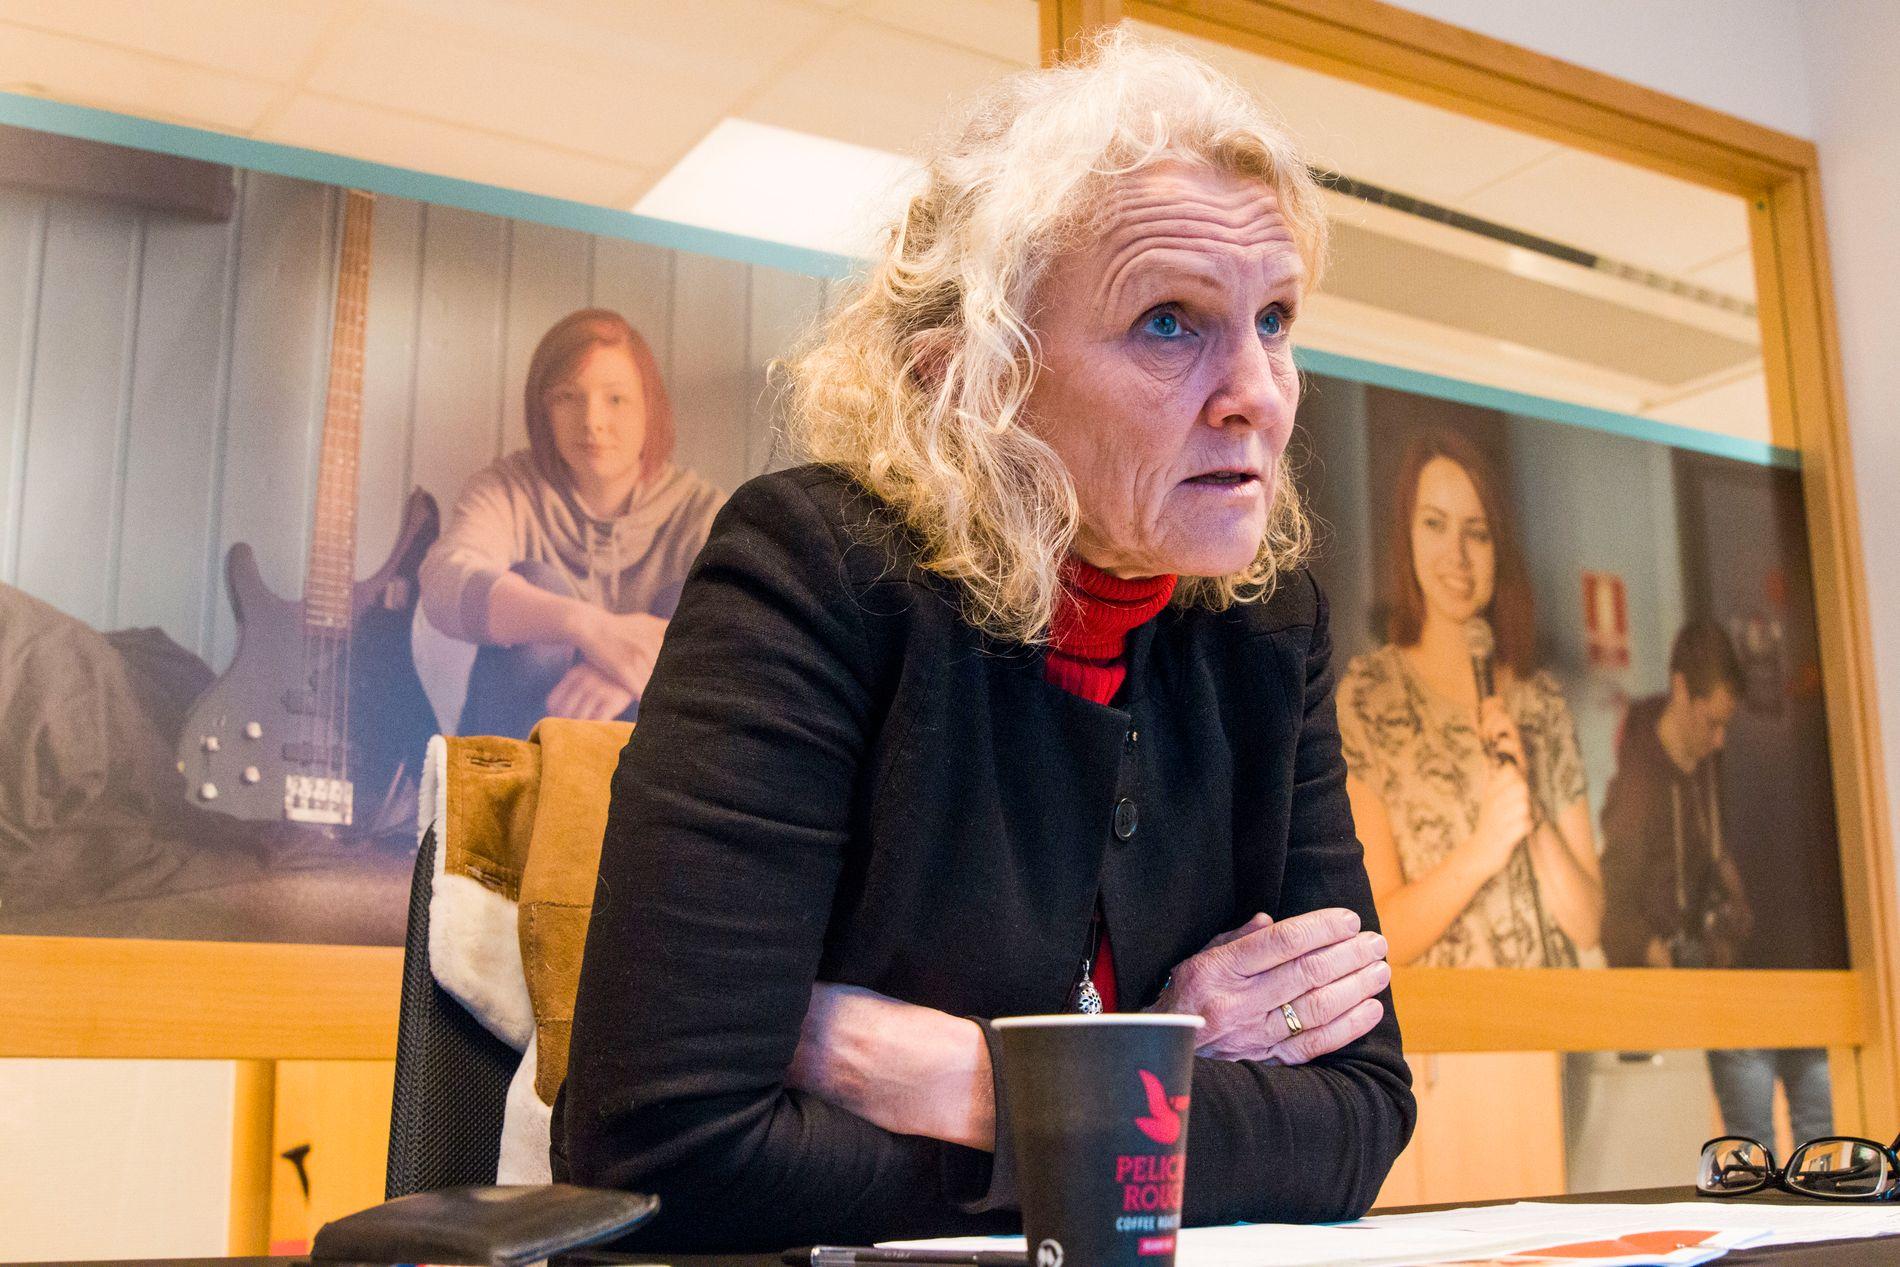 DIREKTØR: Mari Trommald i Barne,- ungdoms- og familiedirektoratet.